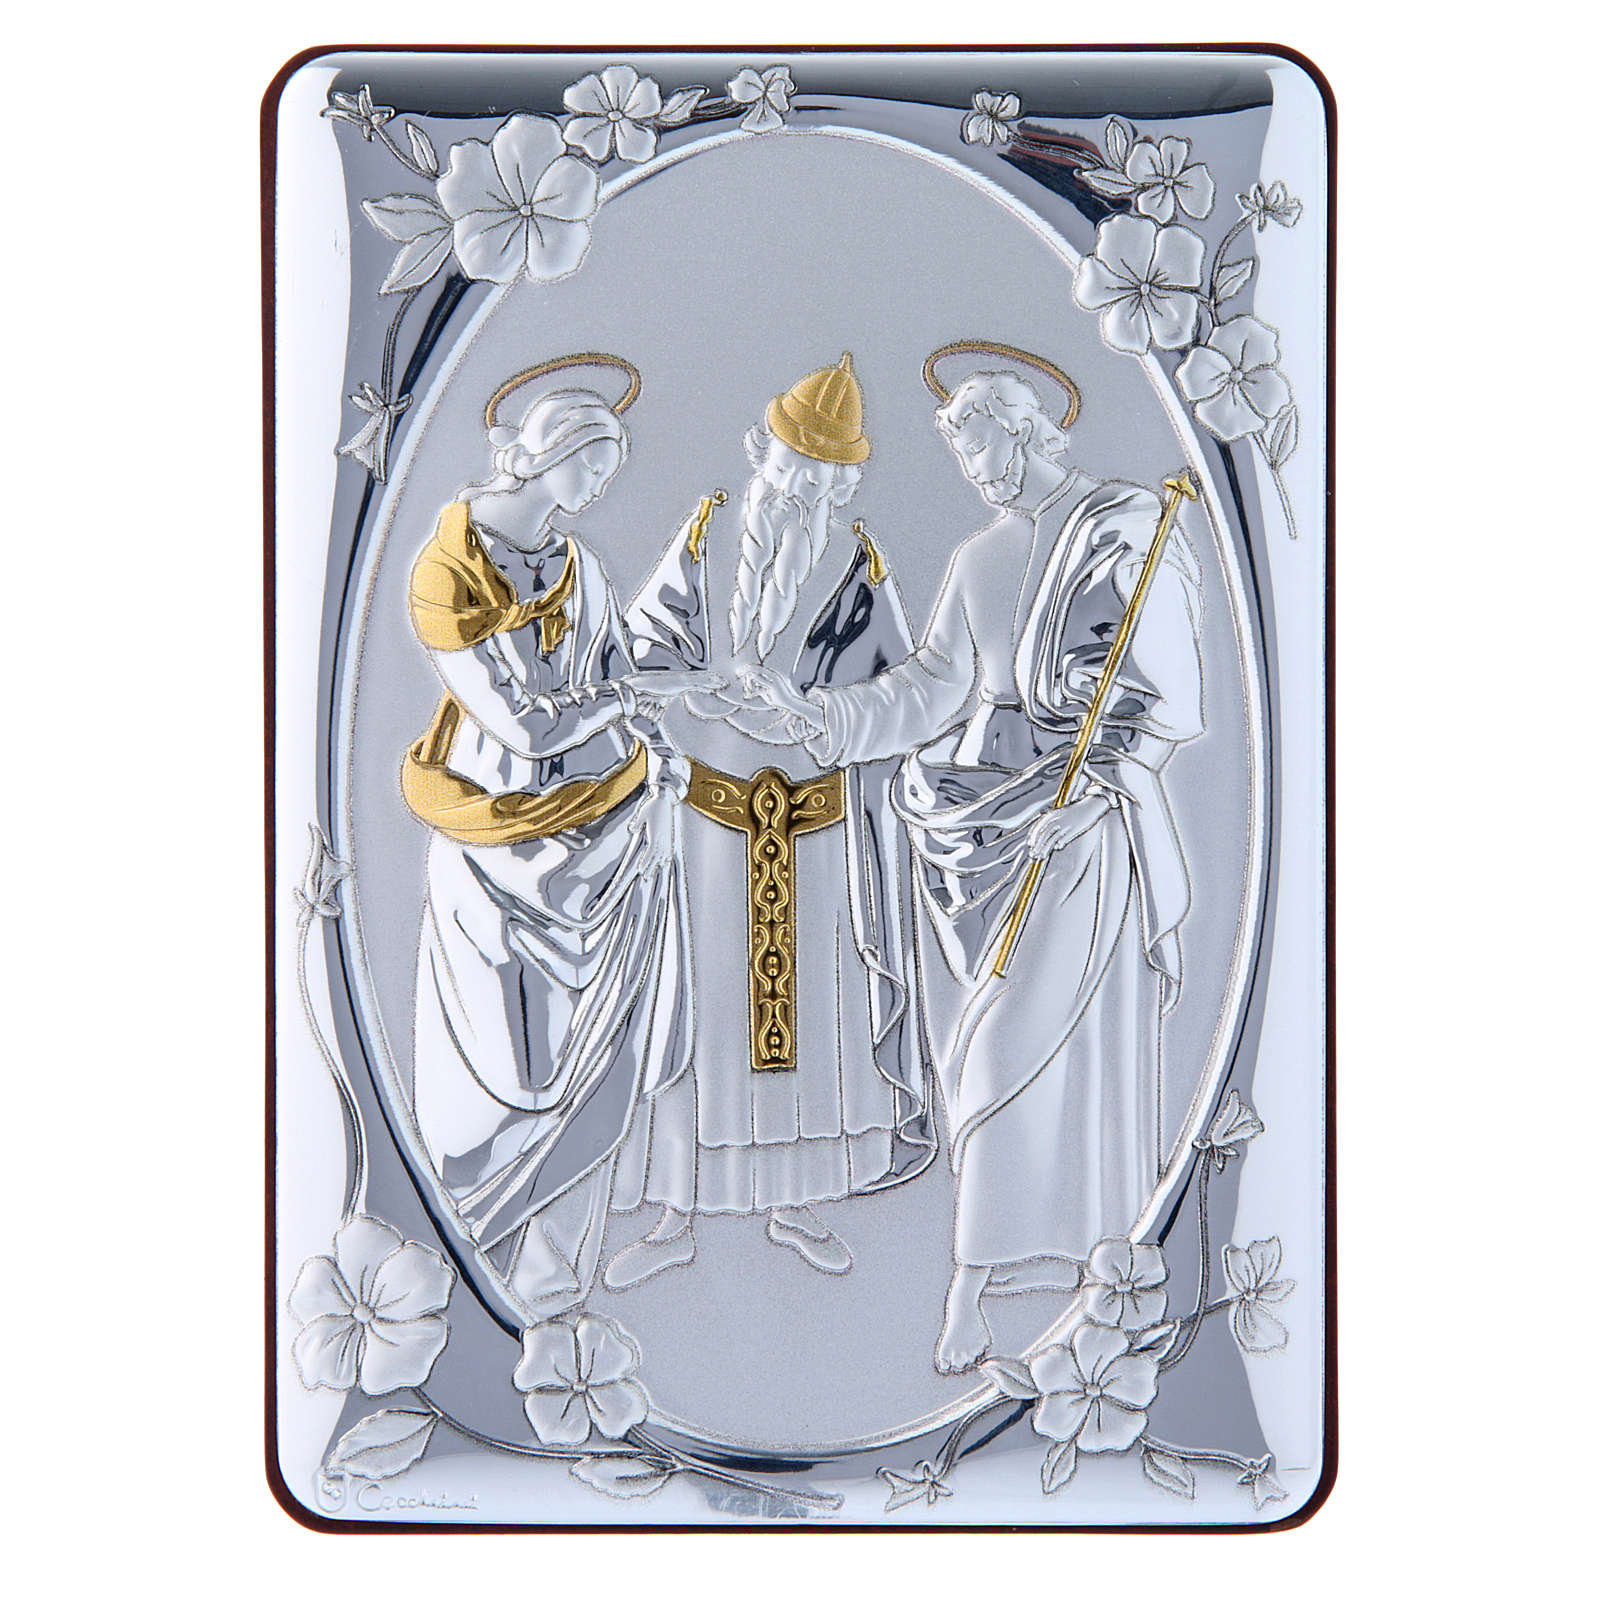 Cuadro Boda Virgen bilaminado parte posterior madera preciosa detalles oro 14x10 cm 4